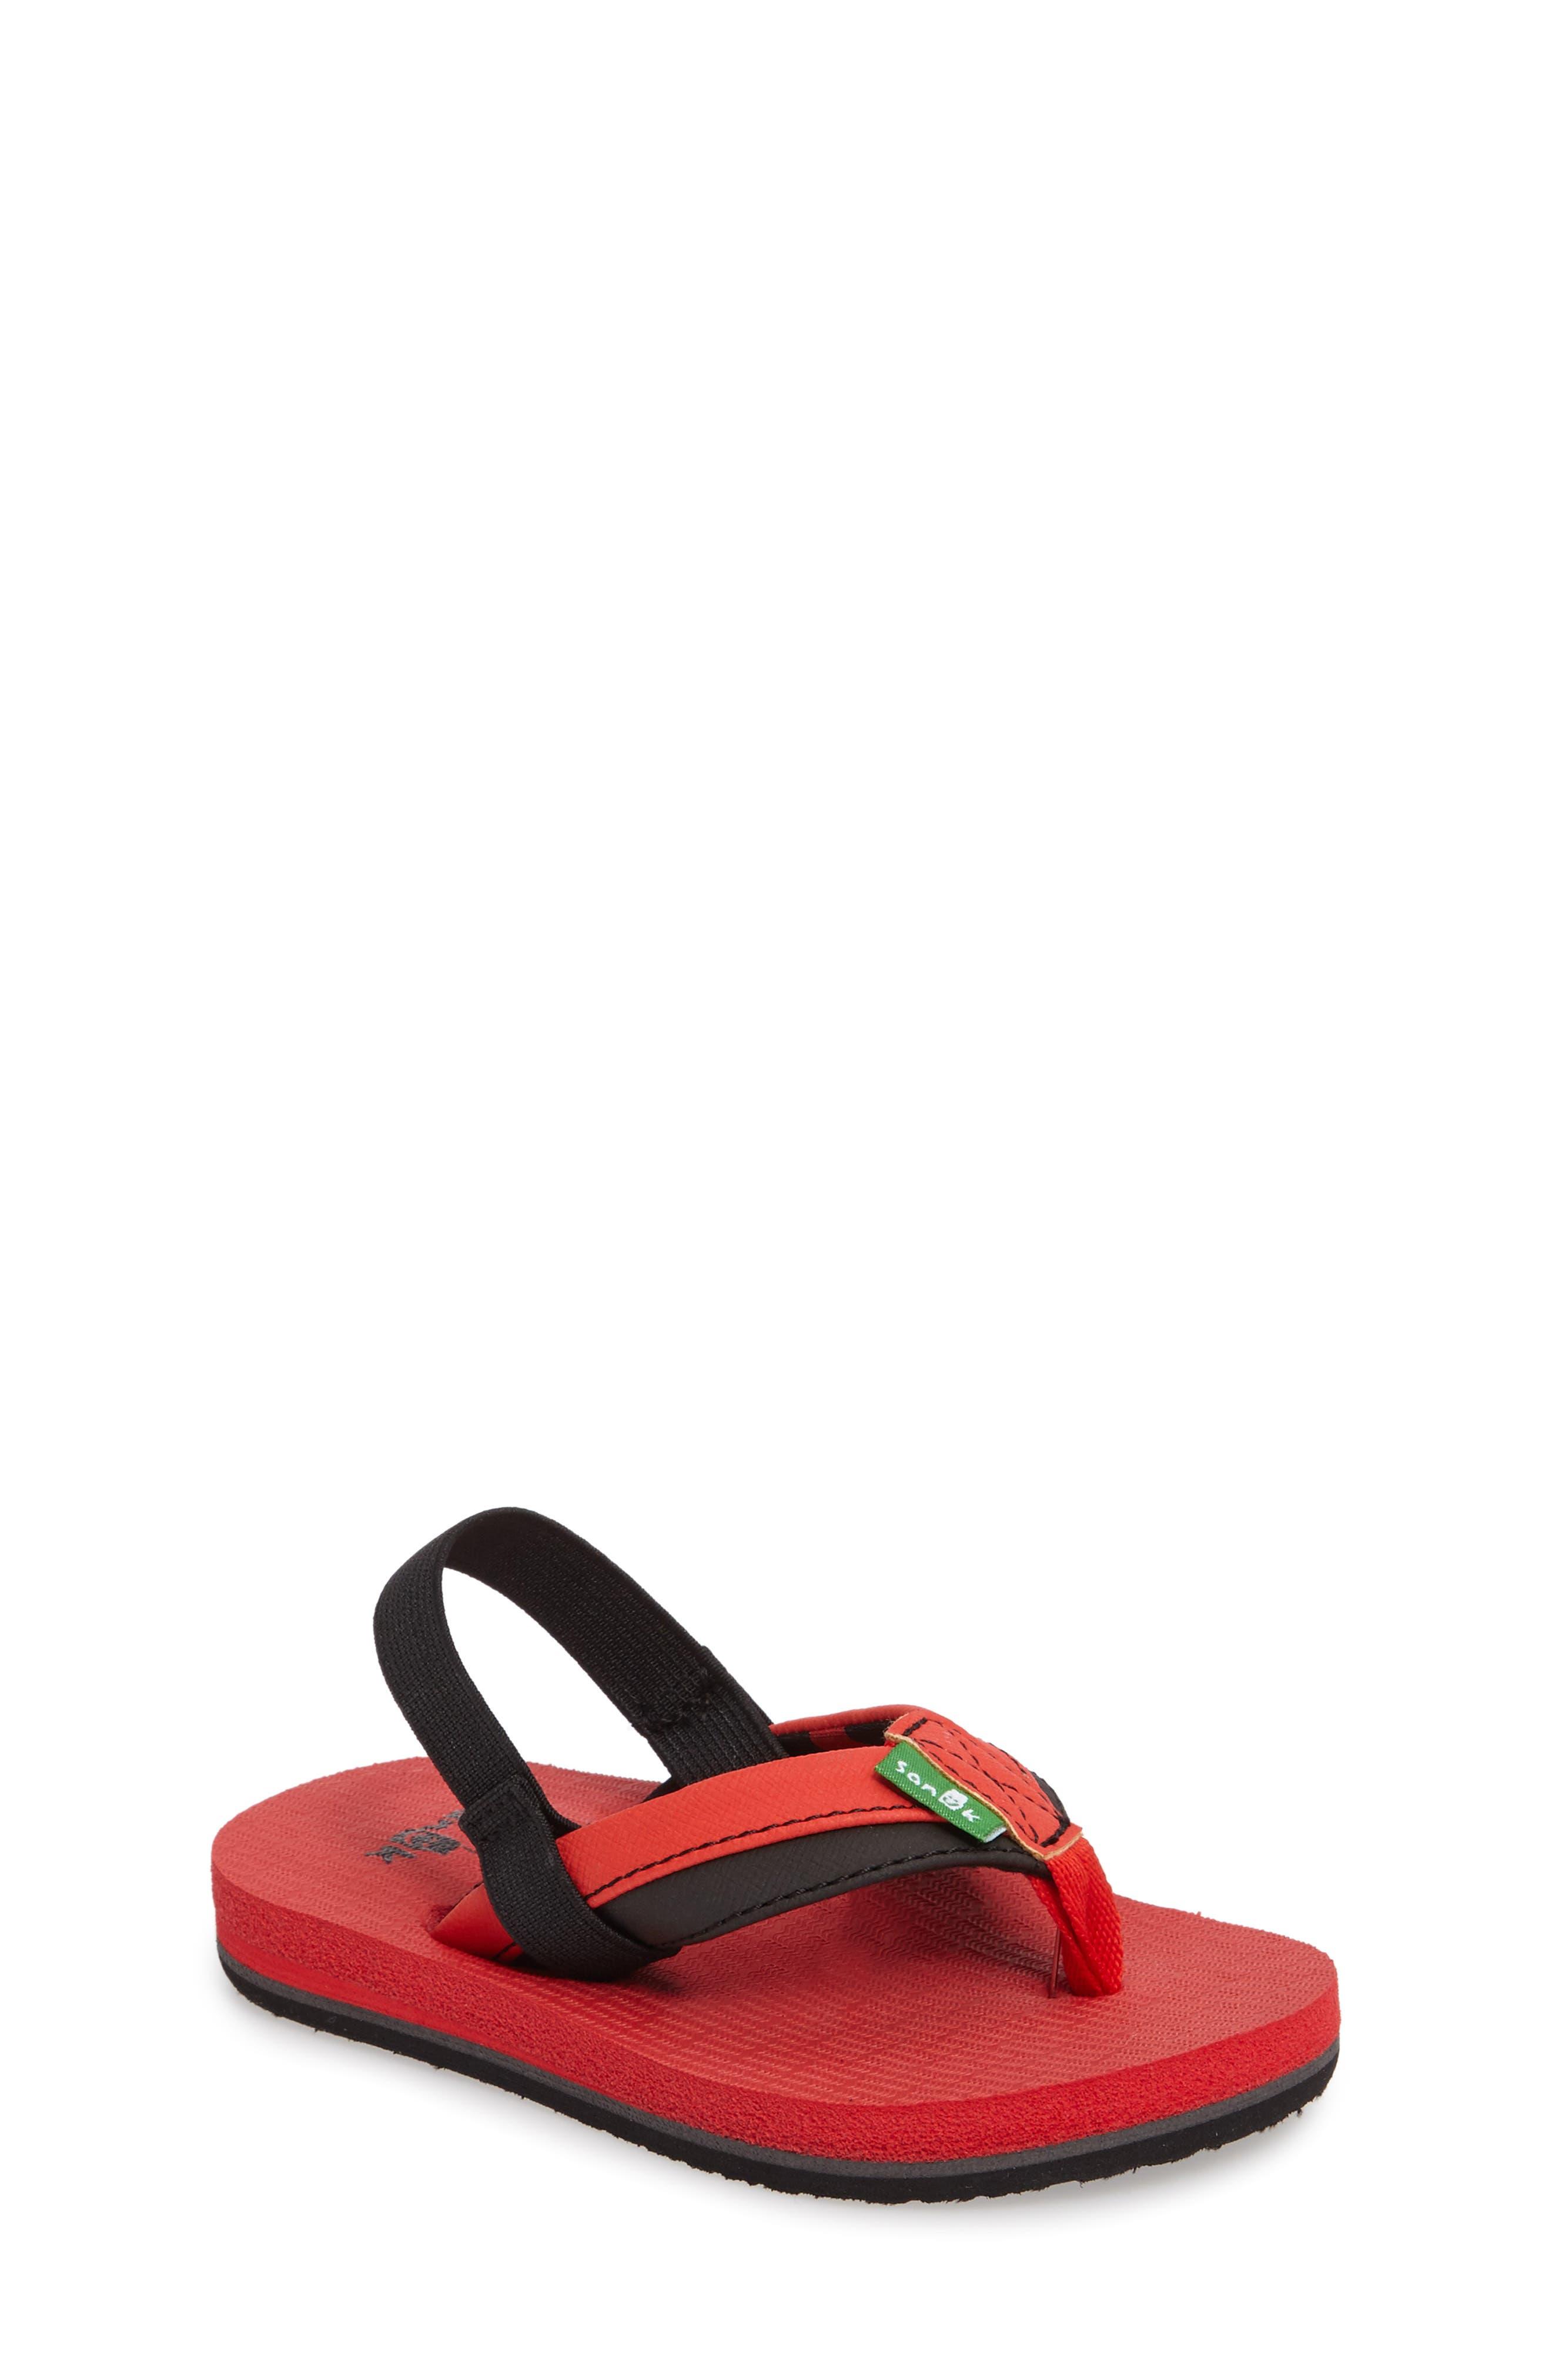 'Rootbeer Cozy' Lightweight Flip Flop Sandal,                             Main thumbnail 5, color,